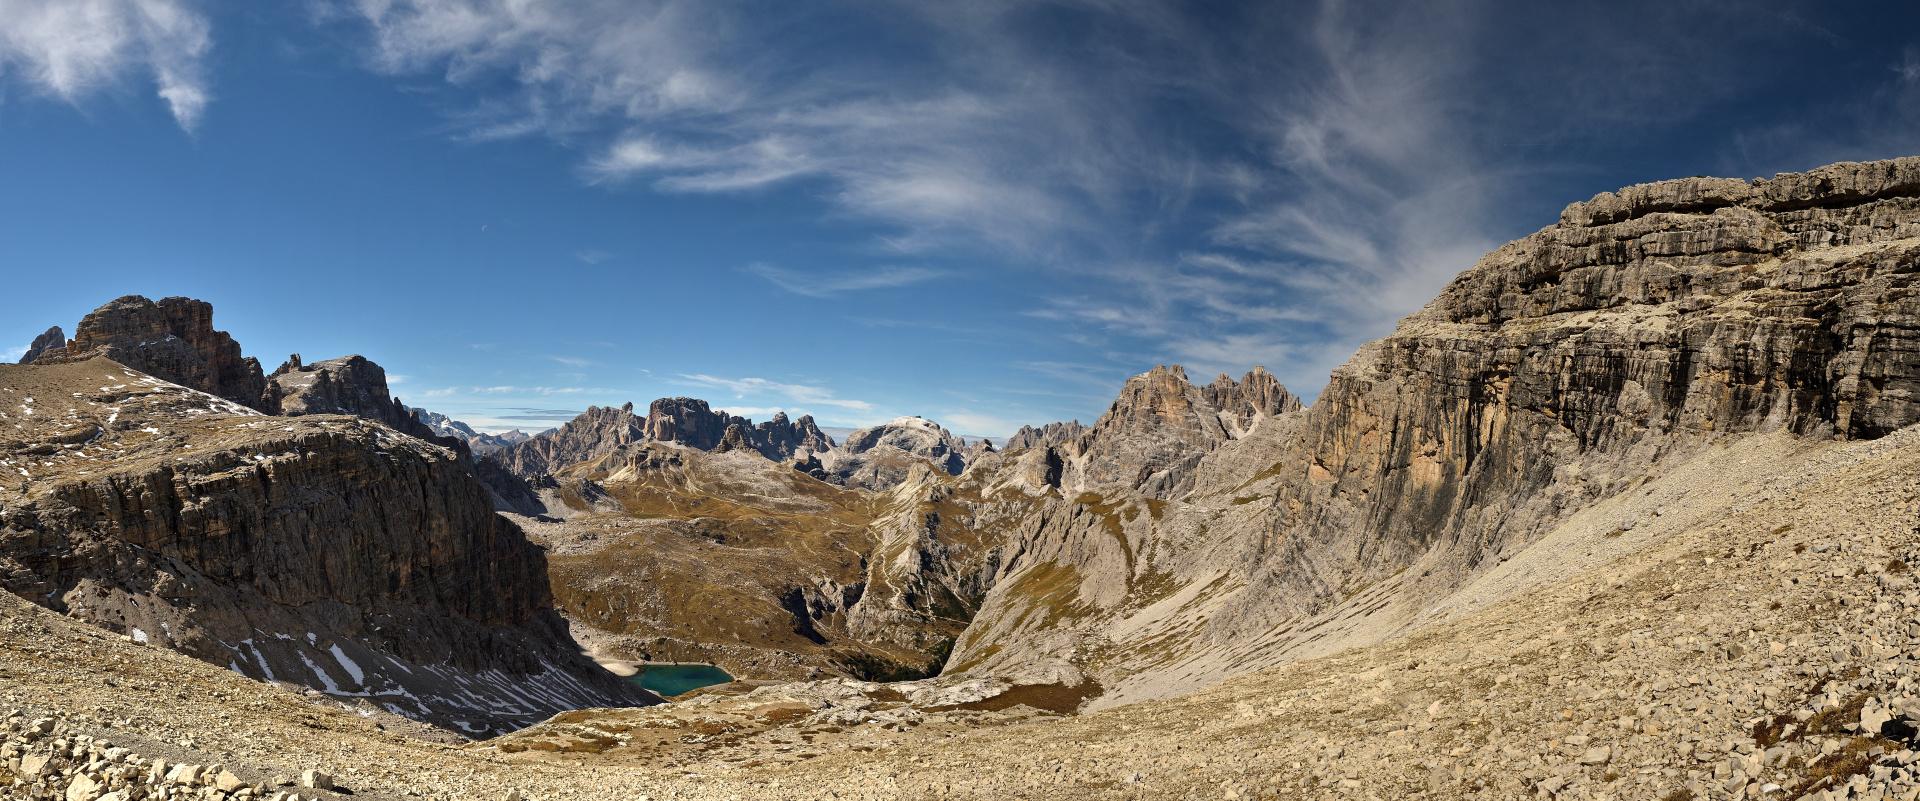 Sextener Dolomiten Pano aus 17 Hochkantaufnahmen...